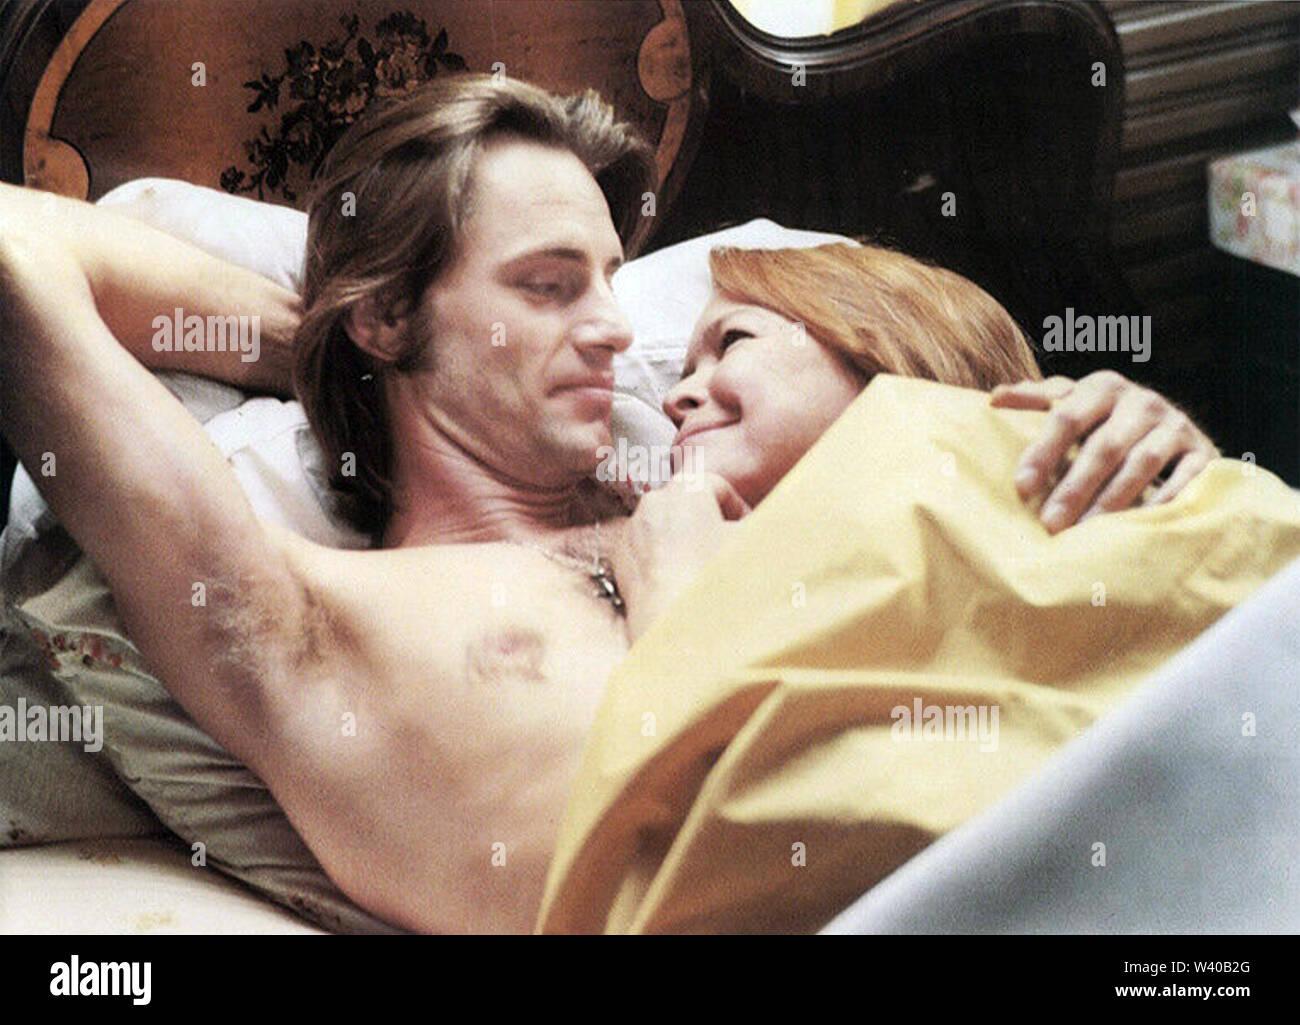 RESURRECTION 1980 Universal Pictures film with Ellen Burstyn and Sam Shepard - Stock Image